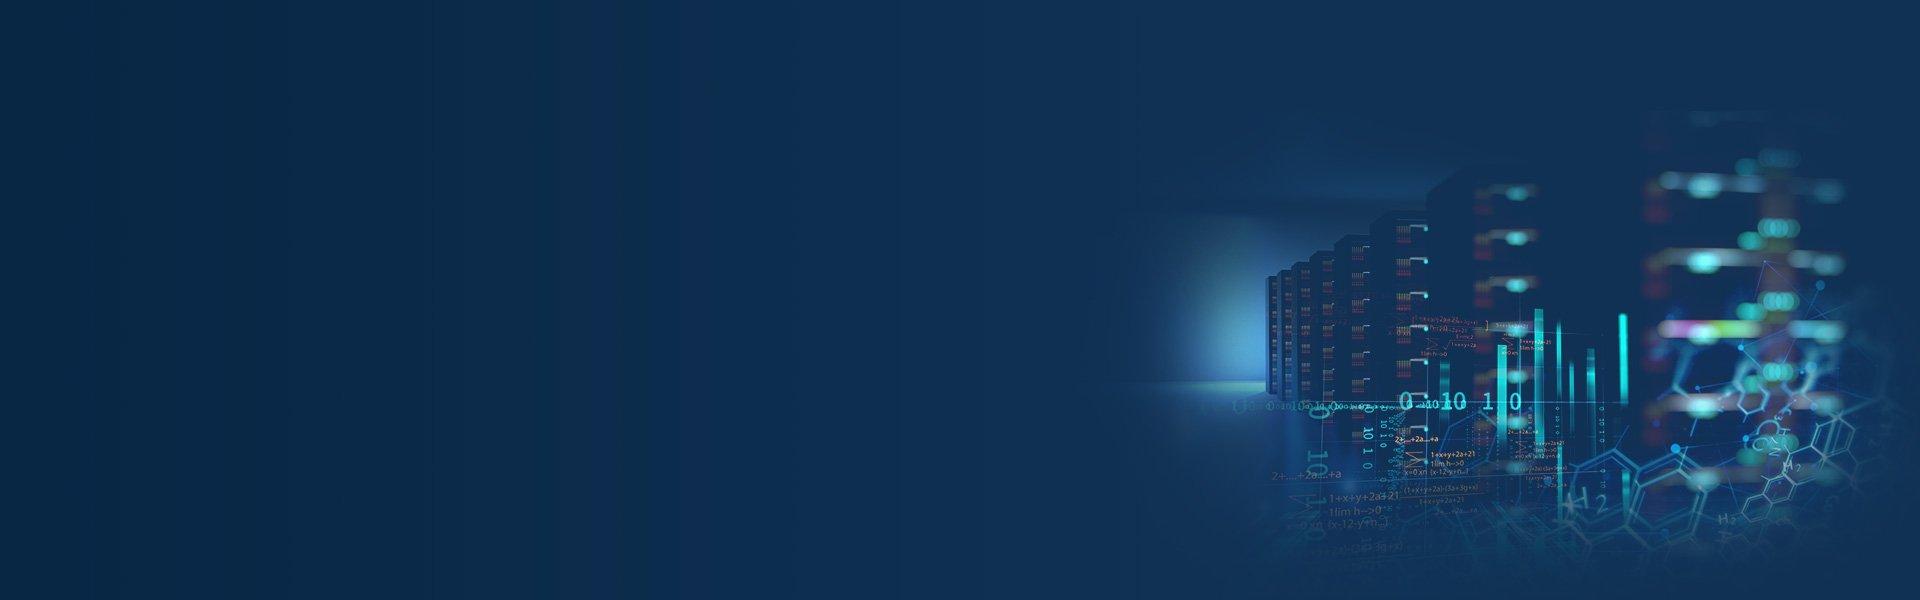 NovaStor_backupsolution_linux_bg-1